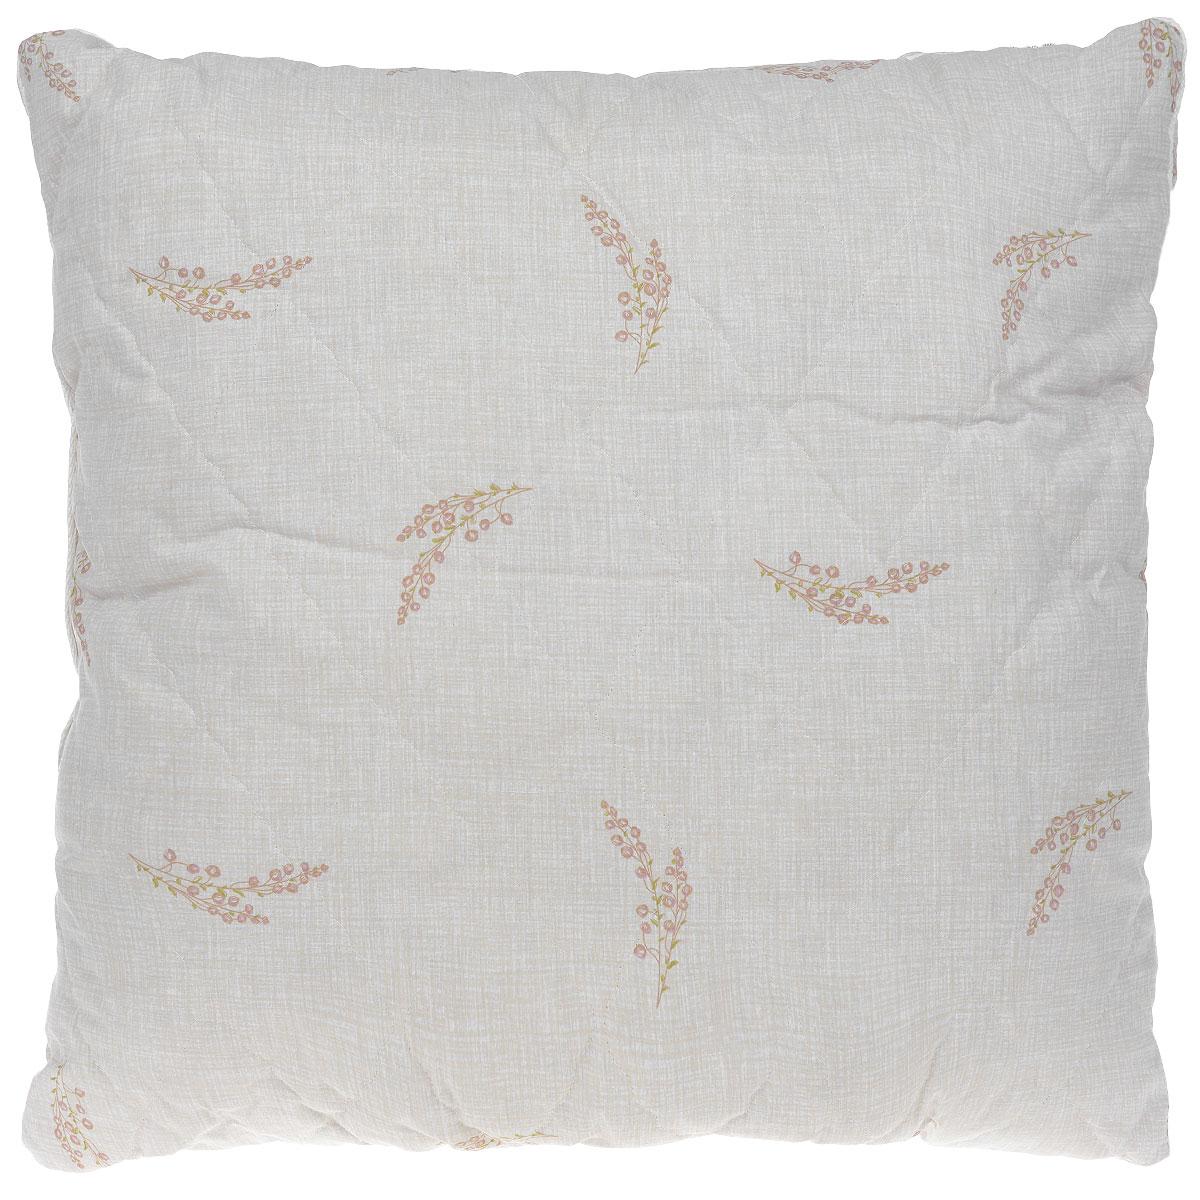 Подушка Mona Liza, наполнитель: полиэстер, 70 х 70 см